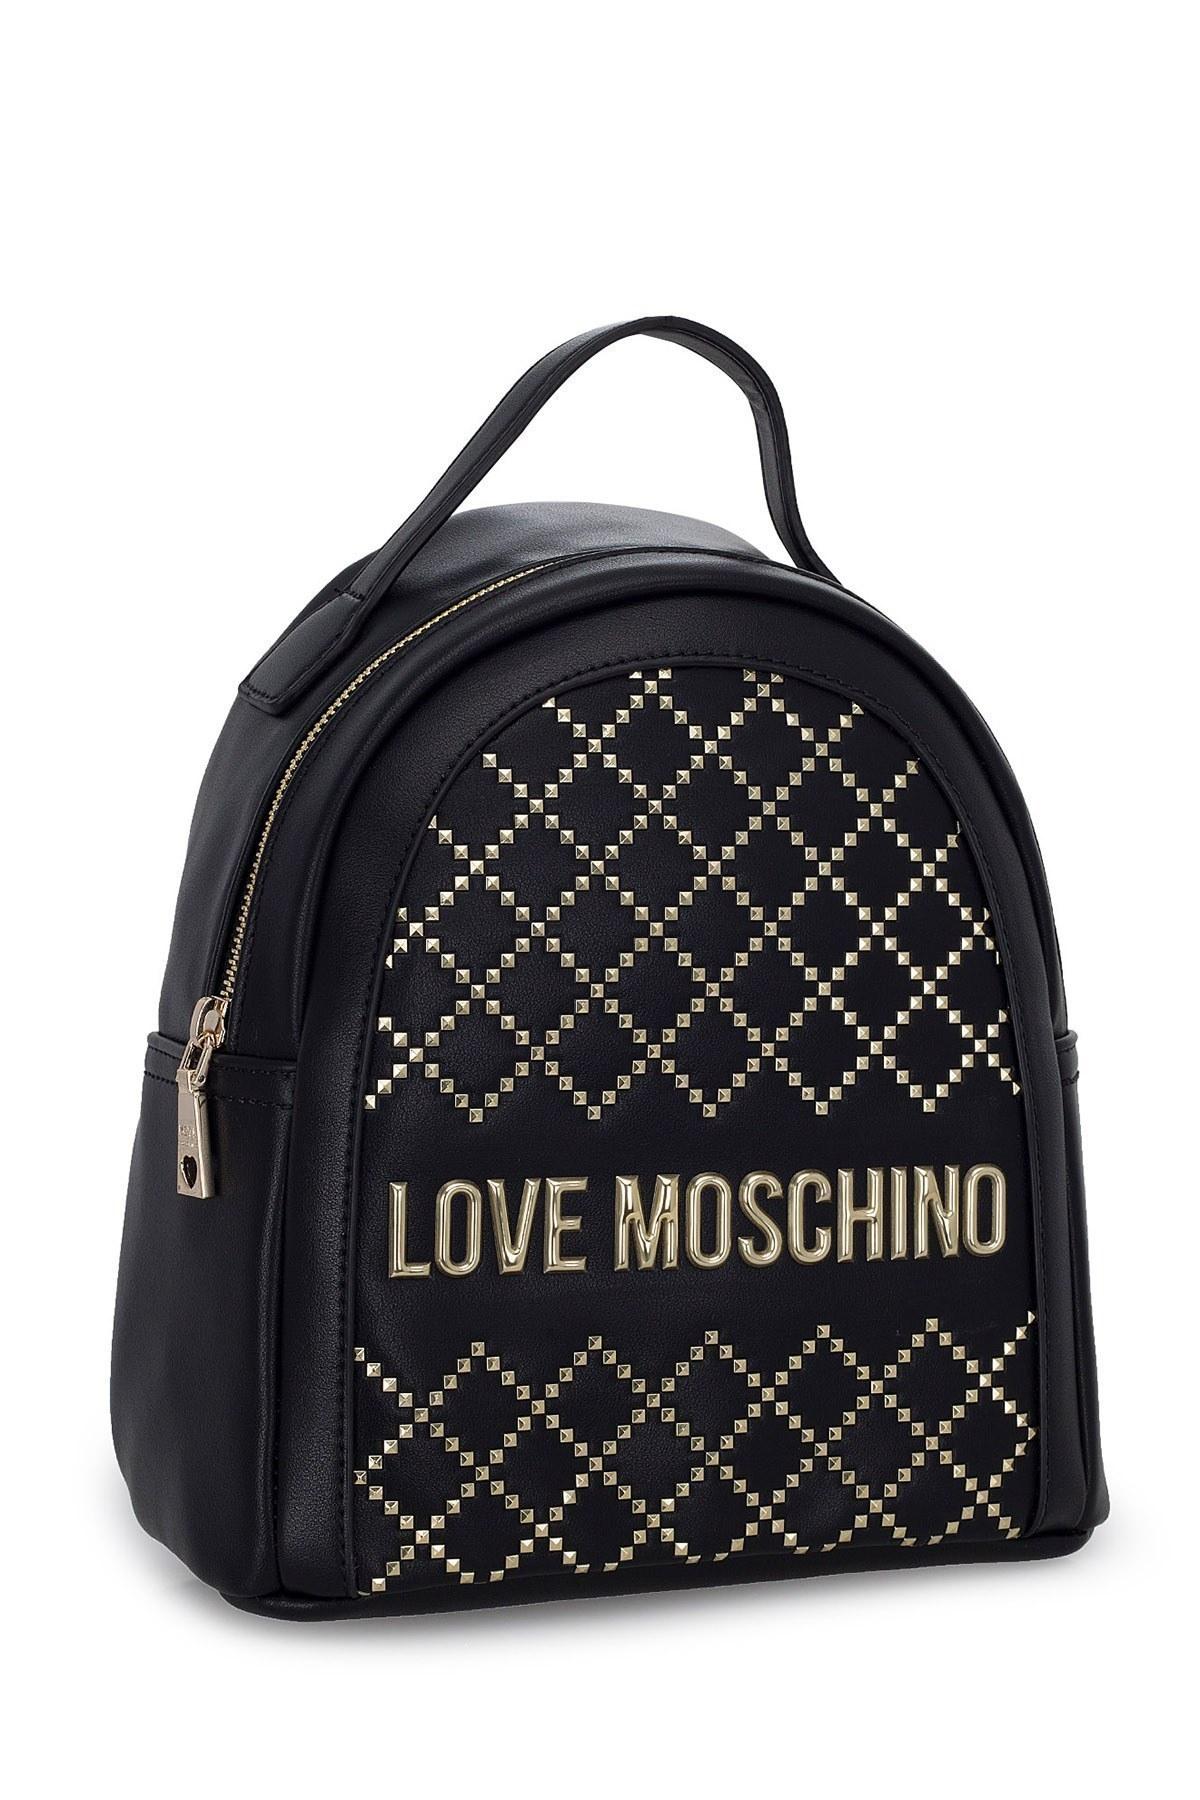 Love Moschino Logo Baskılı Ayarlanabilir Askılı Bayan Çanta JC4051PP1BLG0000 SİYAH